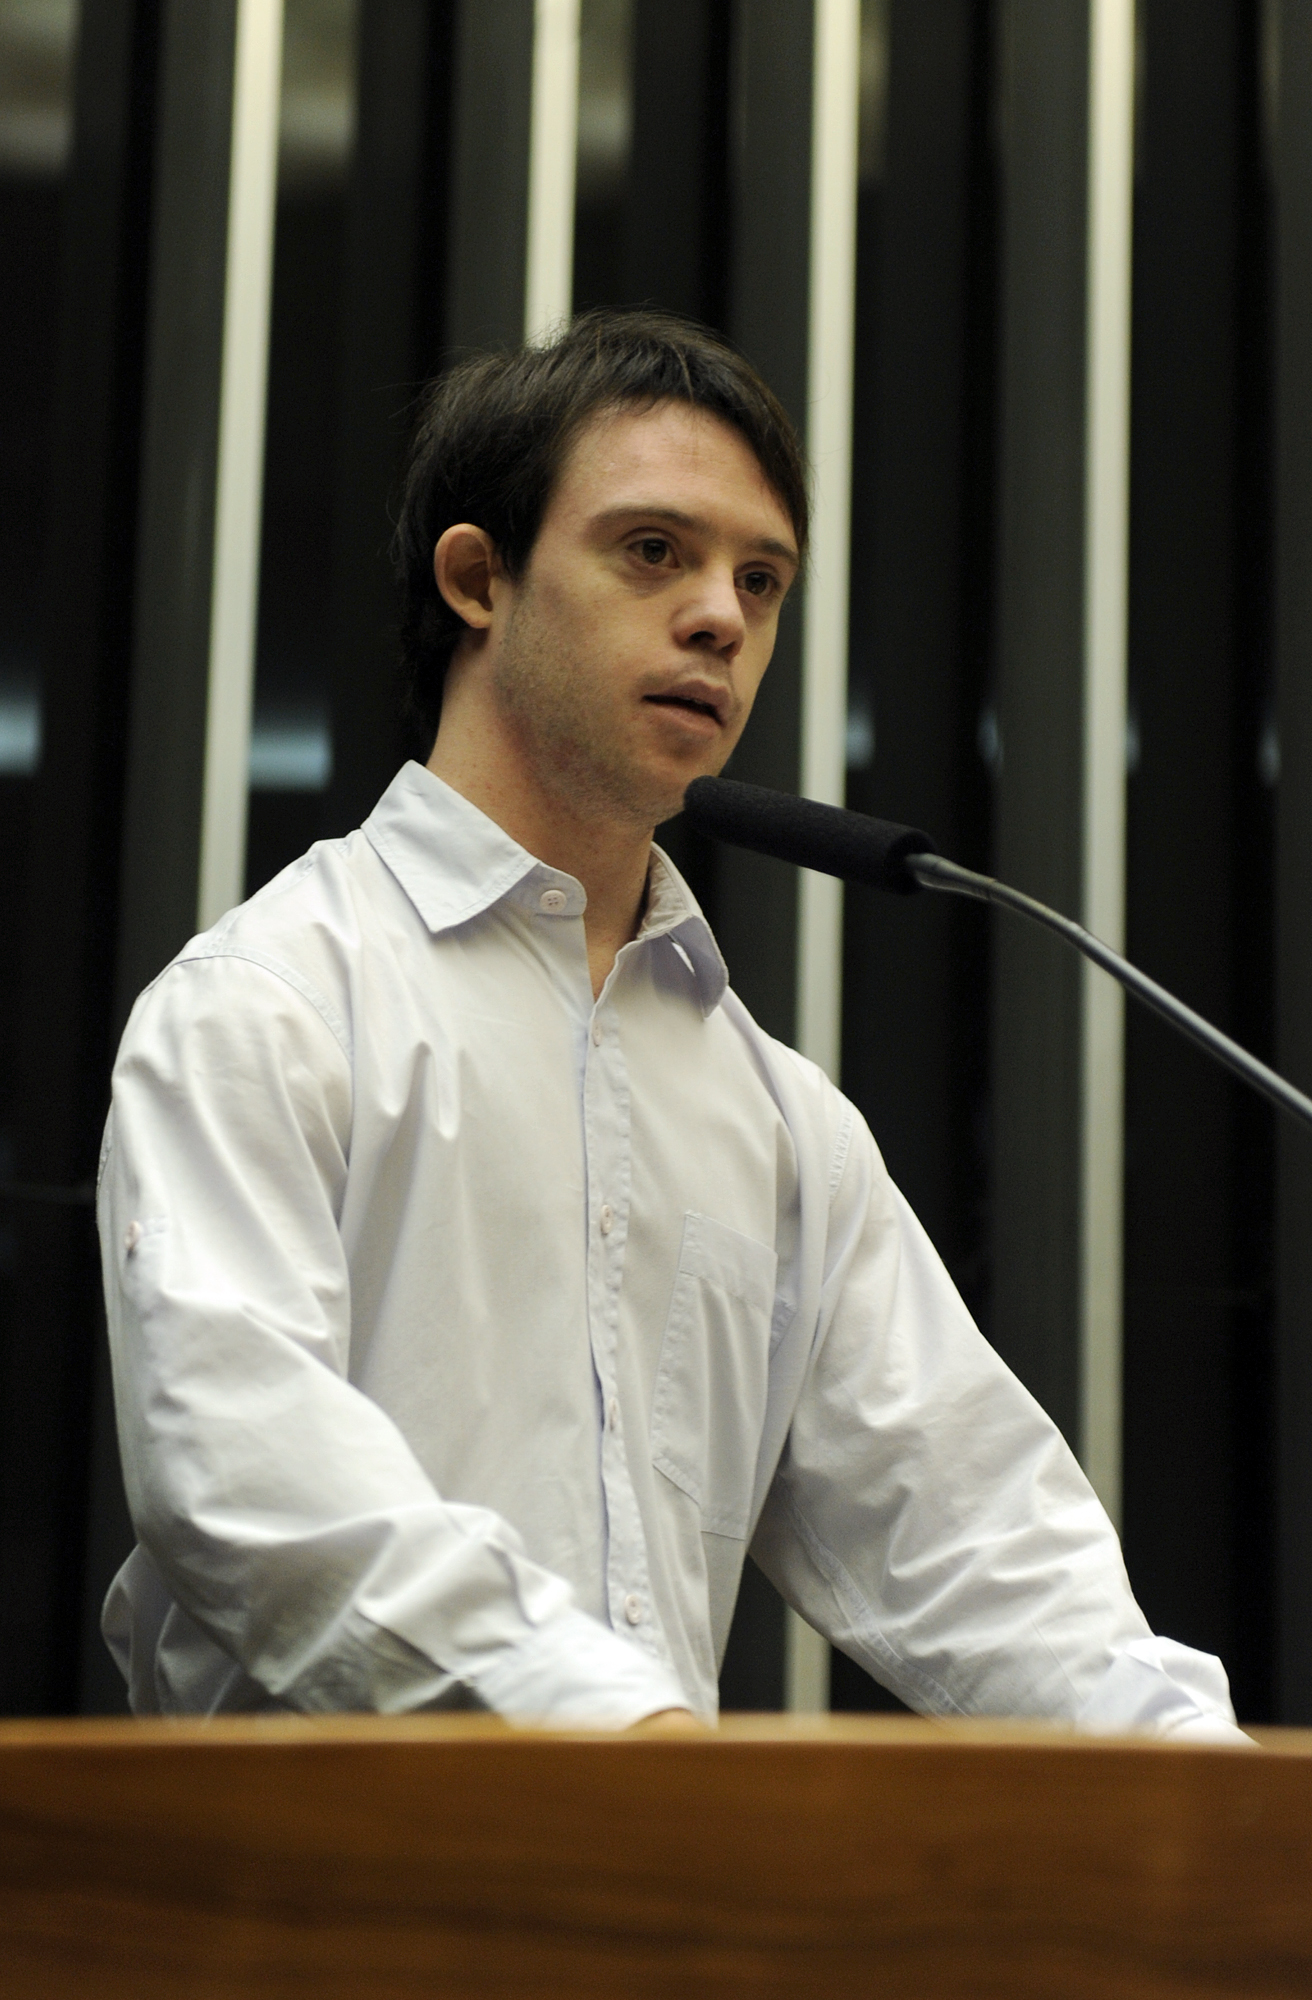 Samuel Sestaro discursa